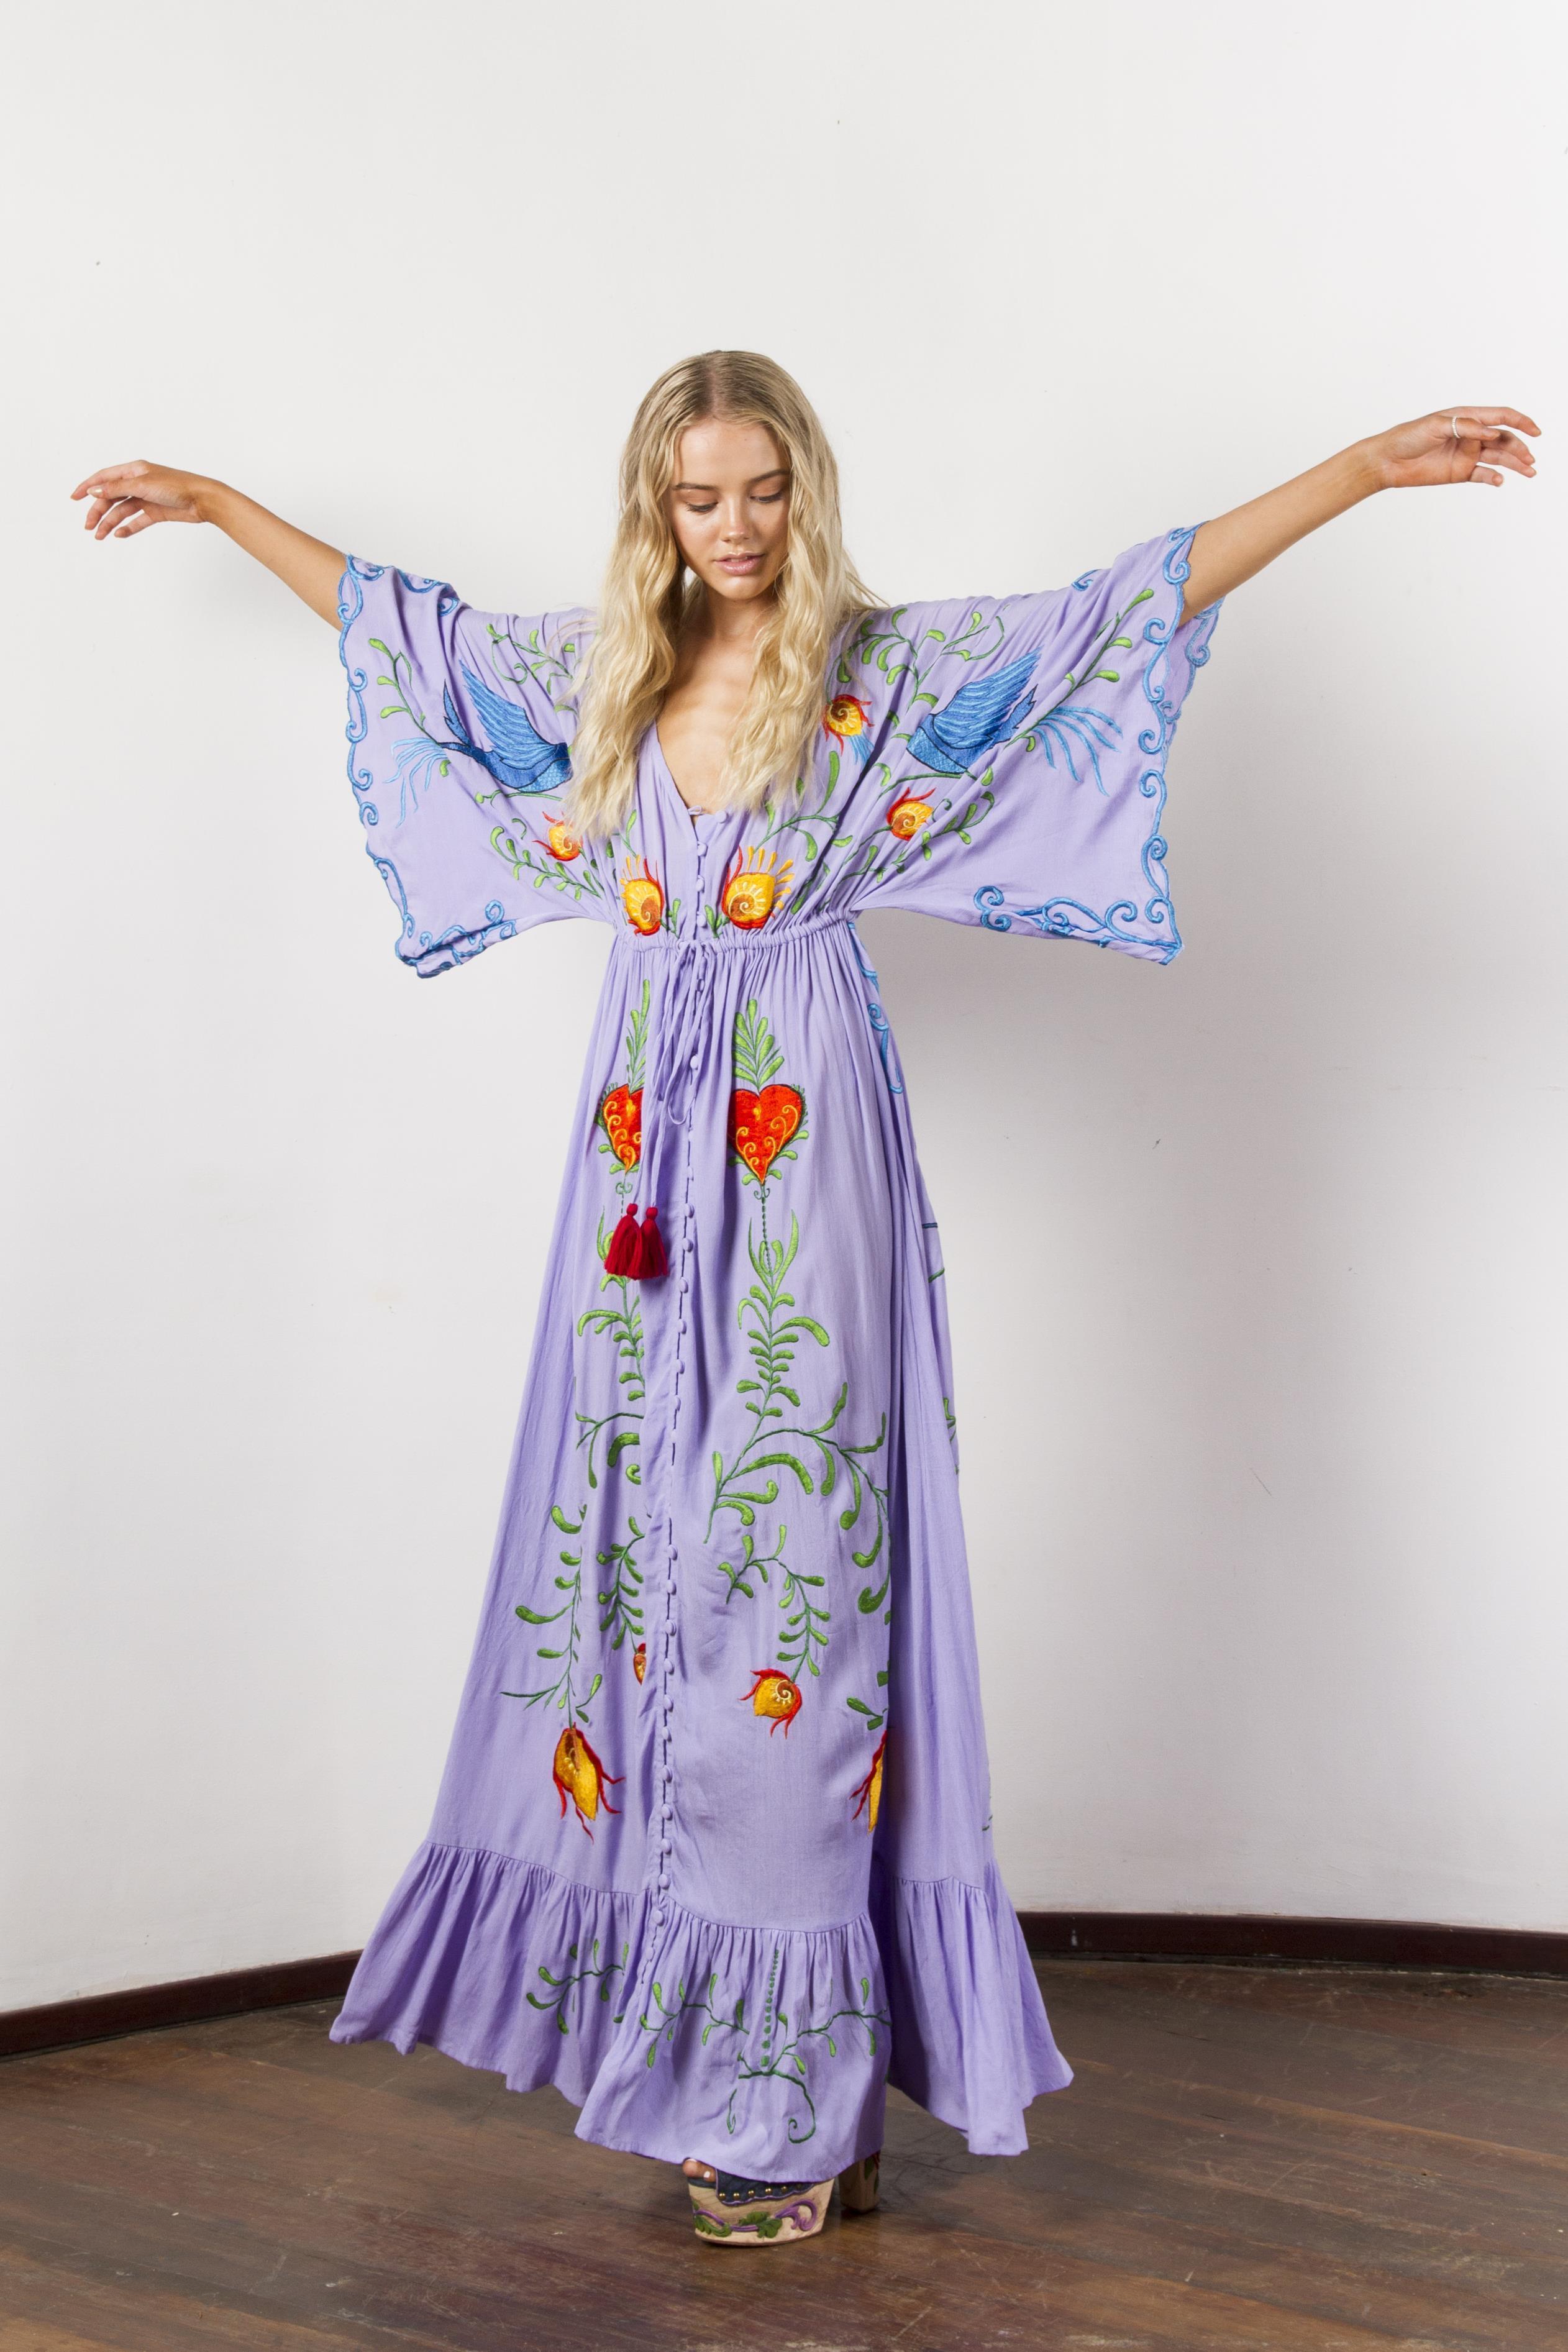 68e681f05824c 2019 Jastie Embroidered Women Maxi Dress V Neck Batwing Sleeve Loose Plus  Size Summer Dresses Drawstring Waist Boho Beach Vestidos Q190521 From ...